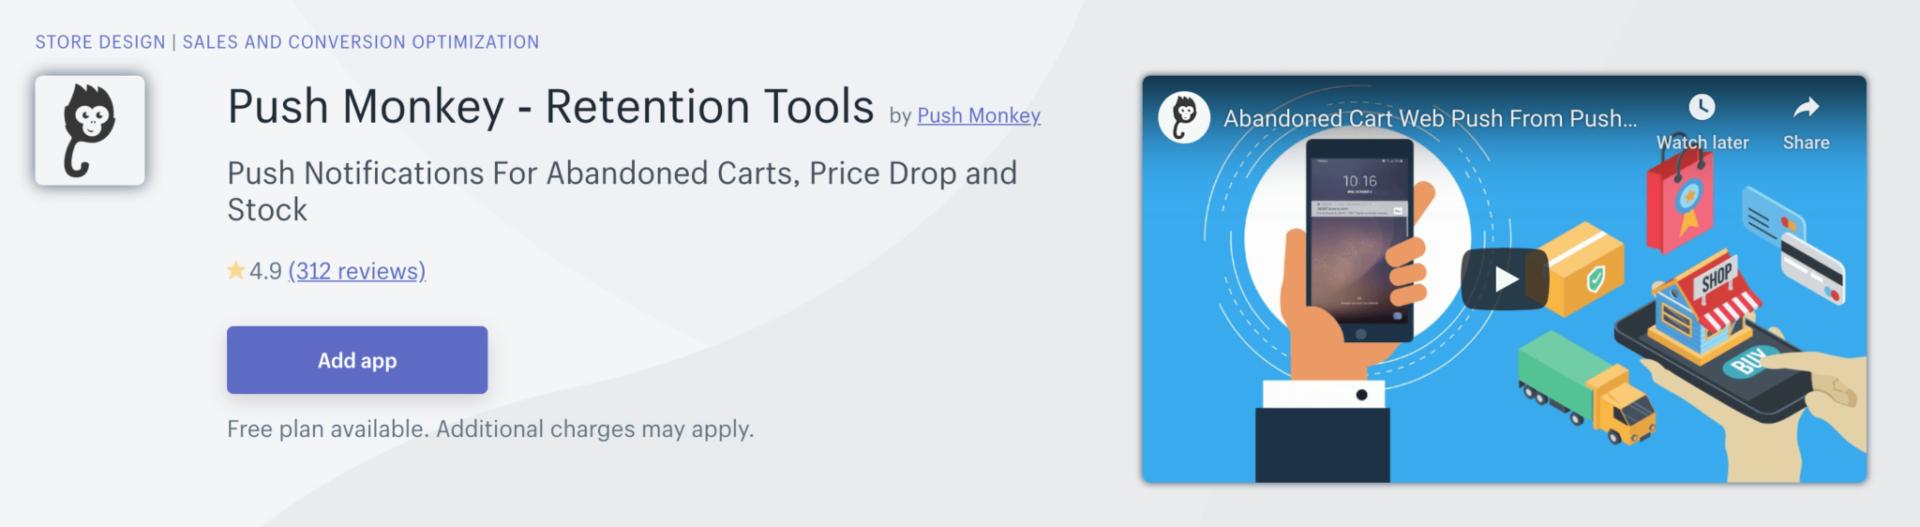 Push Monkey abandoned carts, price drop and stock push notifications